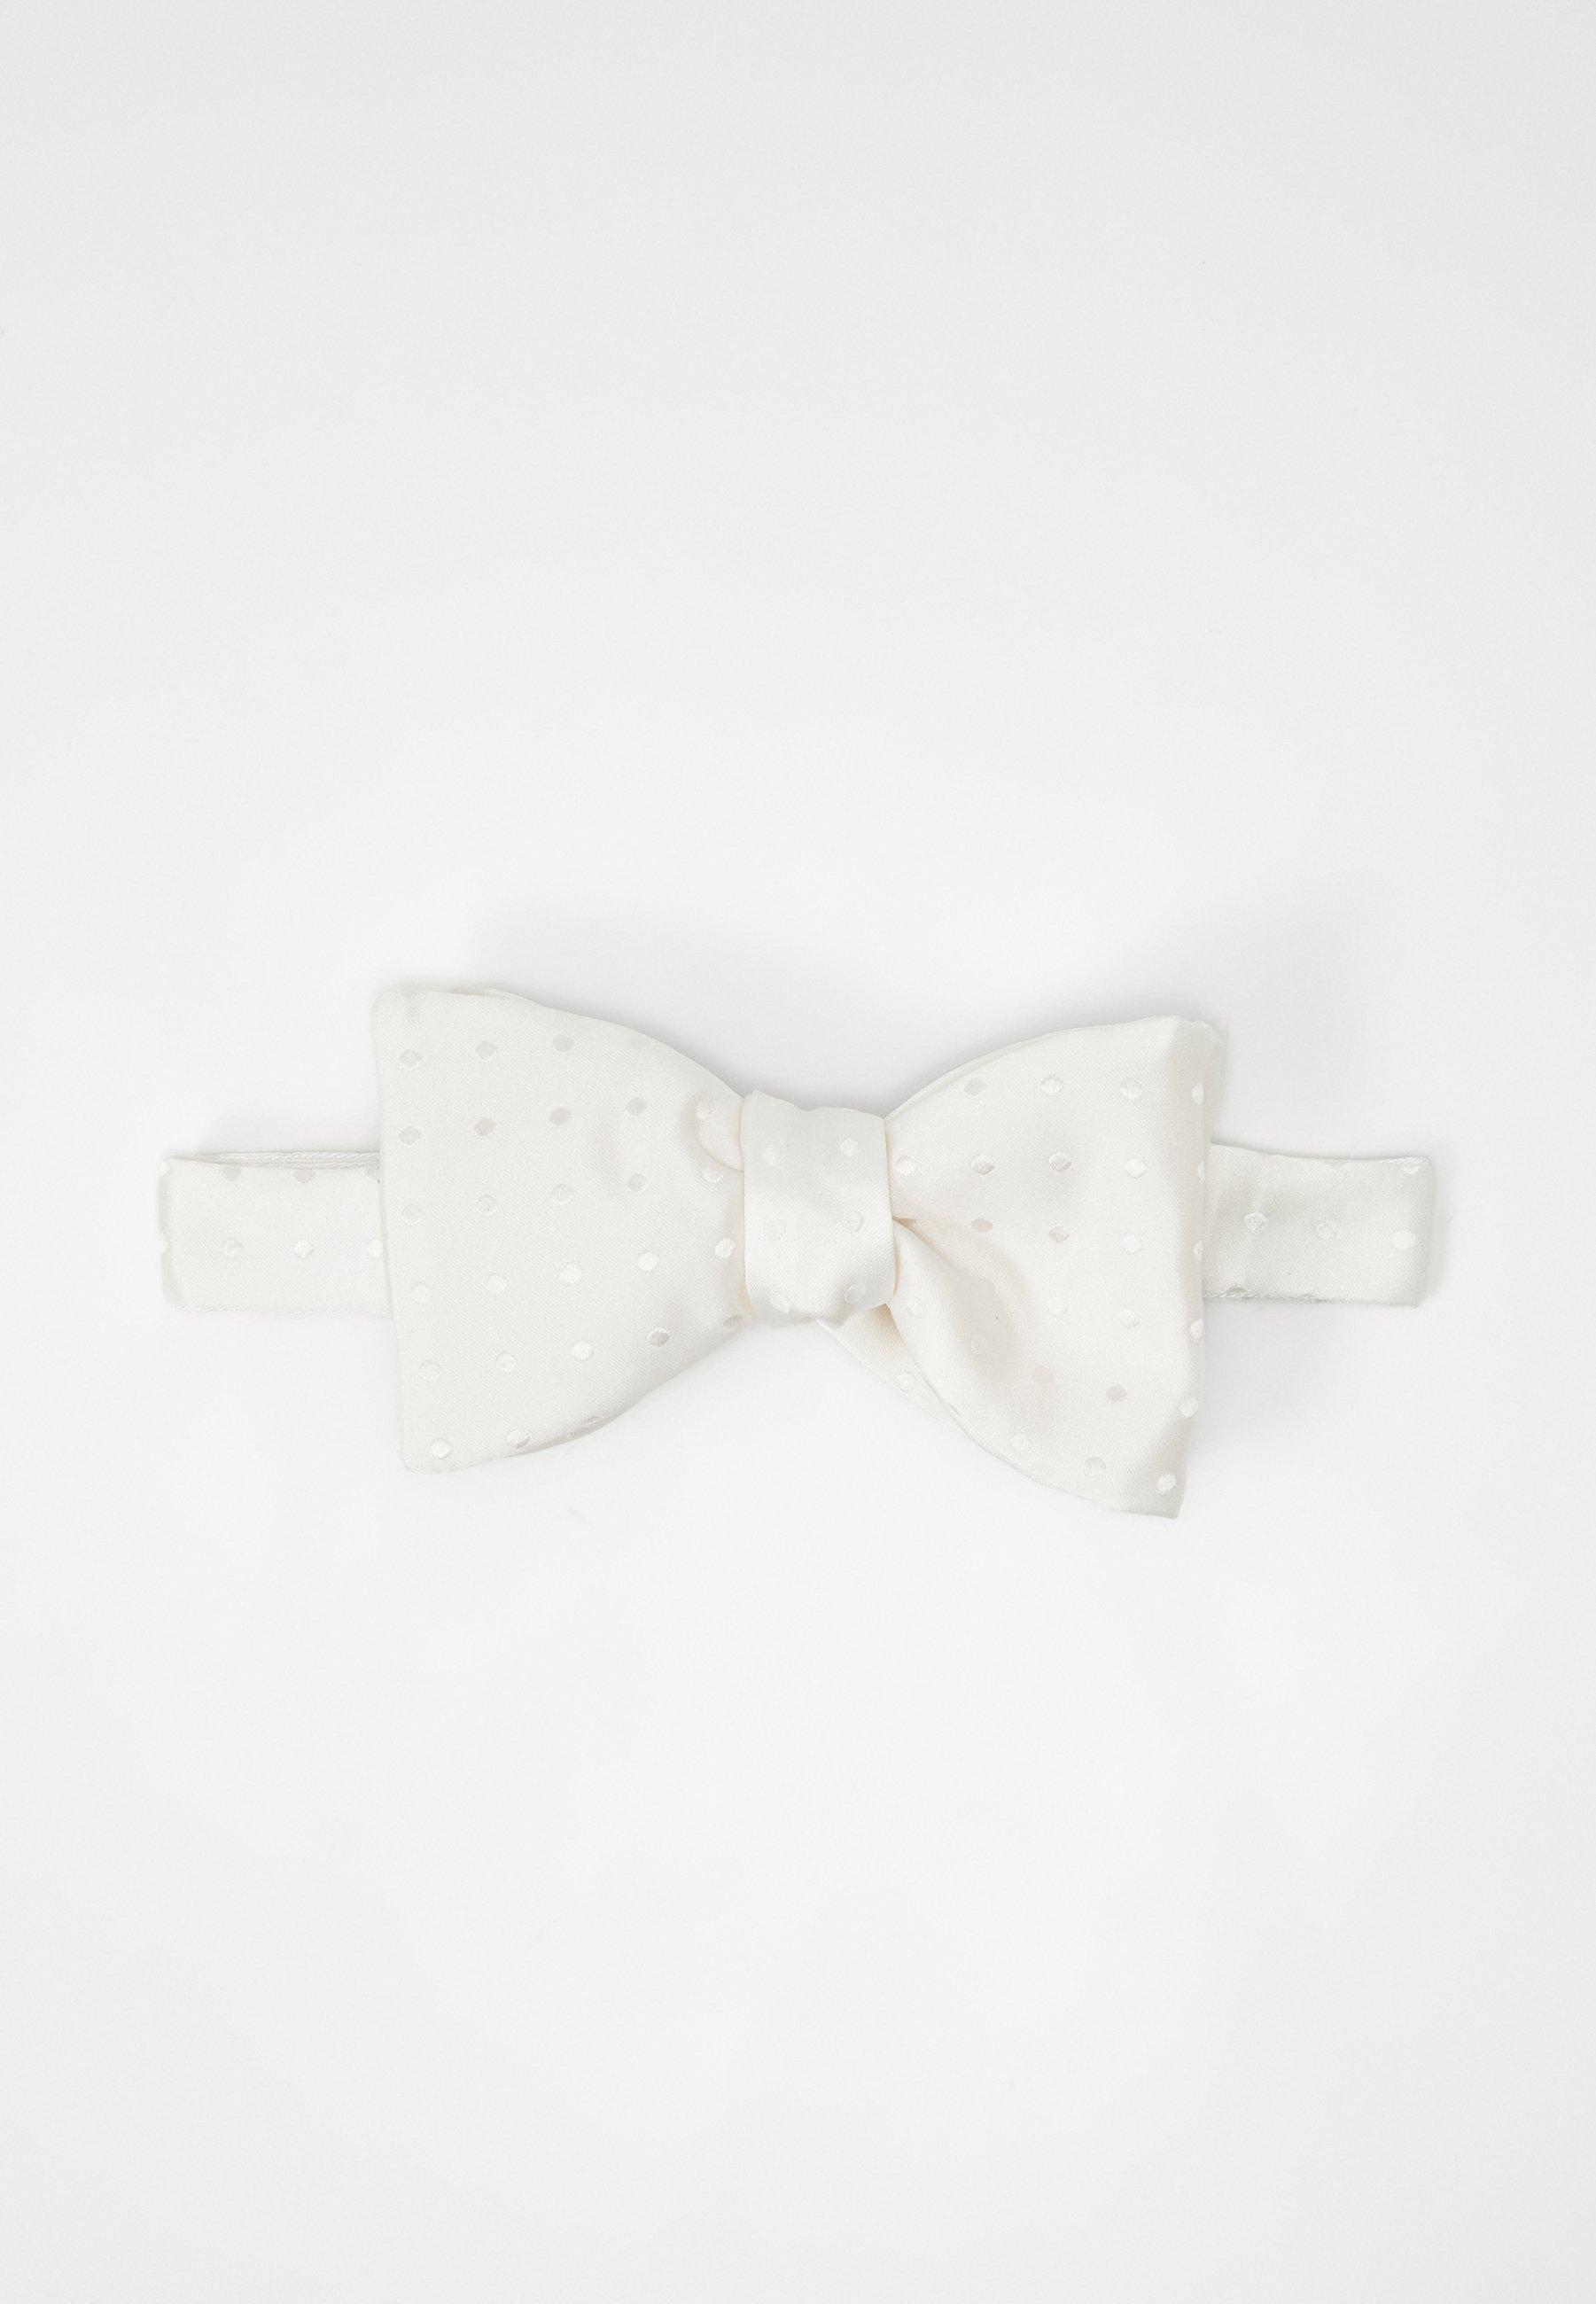 Eton LUSTROUS BOW TIE - Bow tie - white/hvit NyhEjZCHLt5XZKK